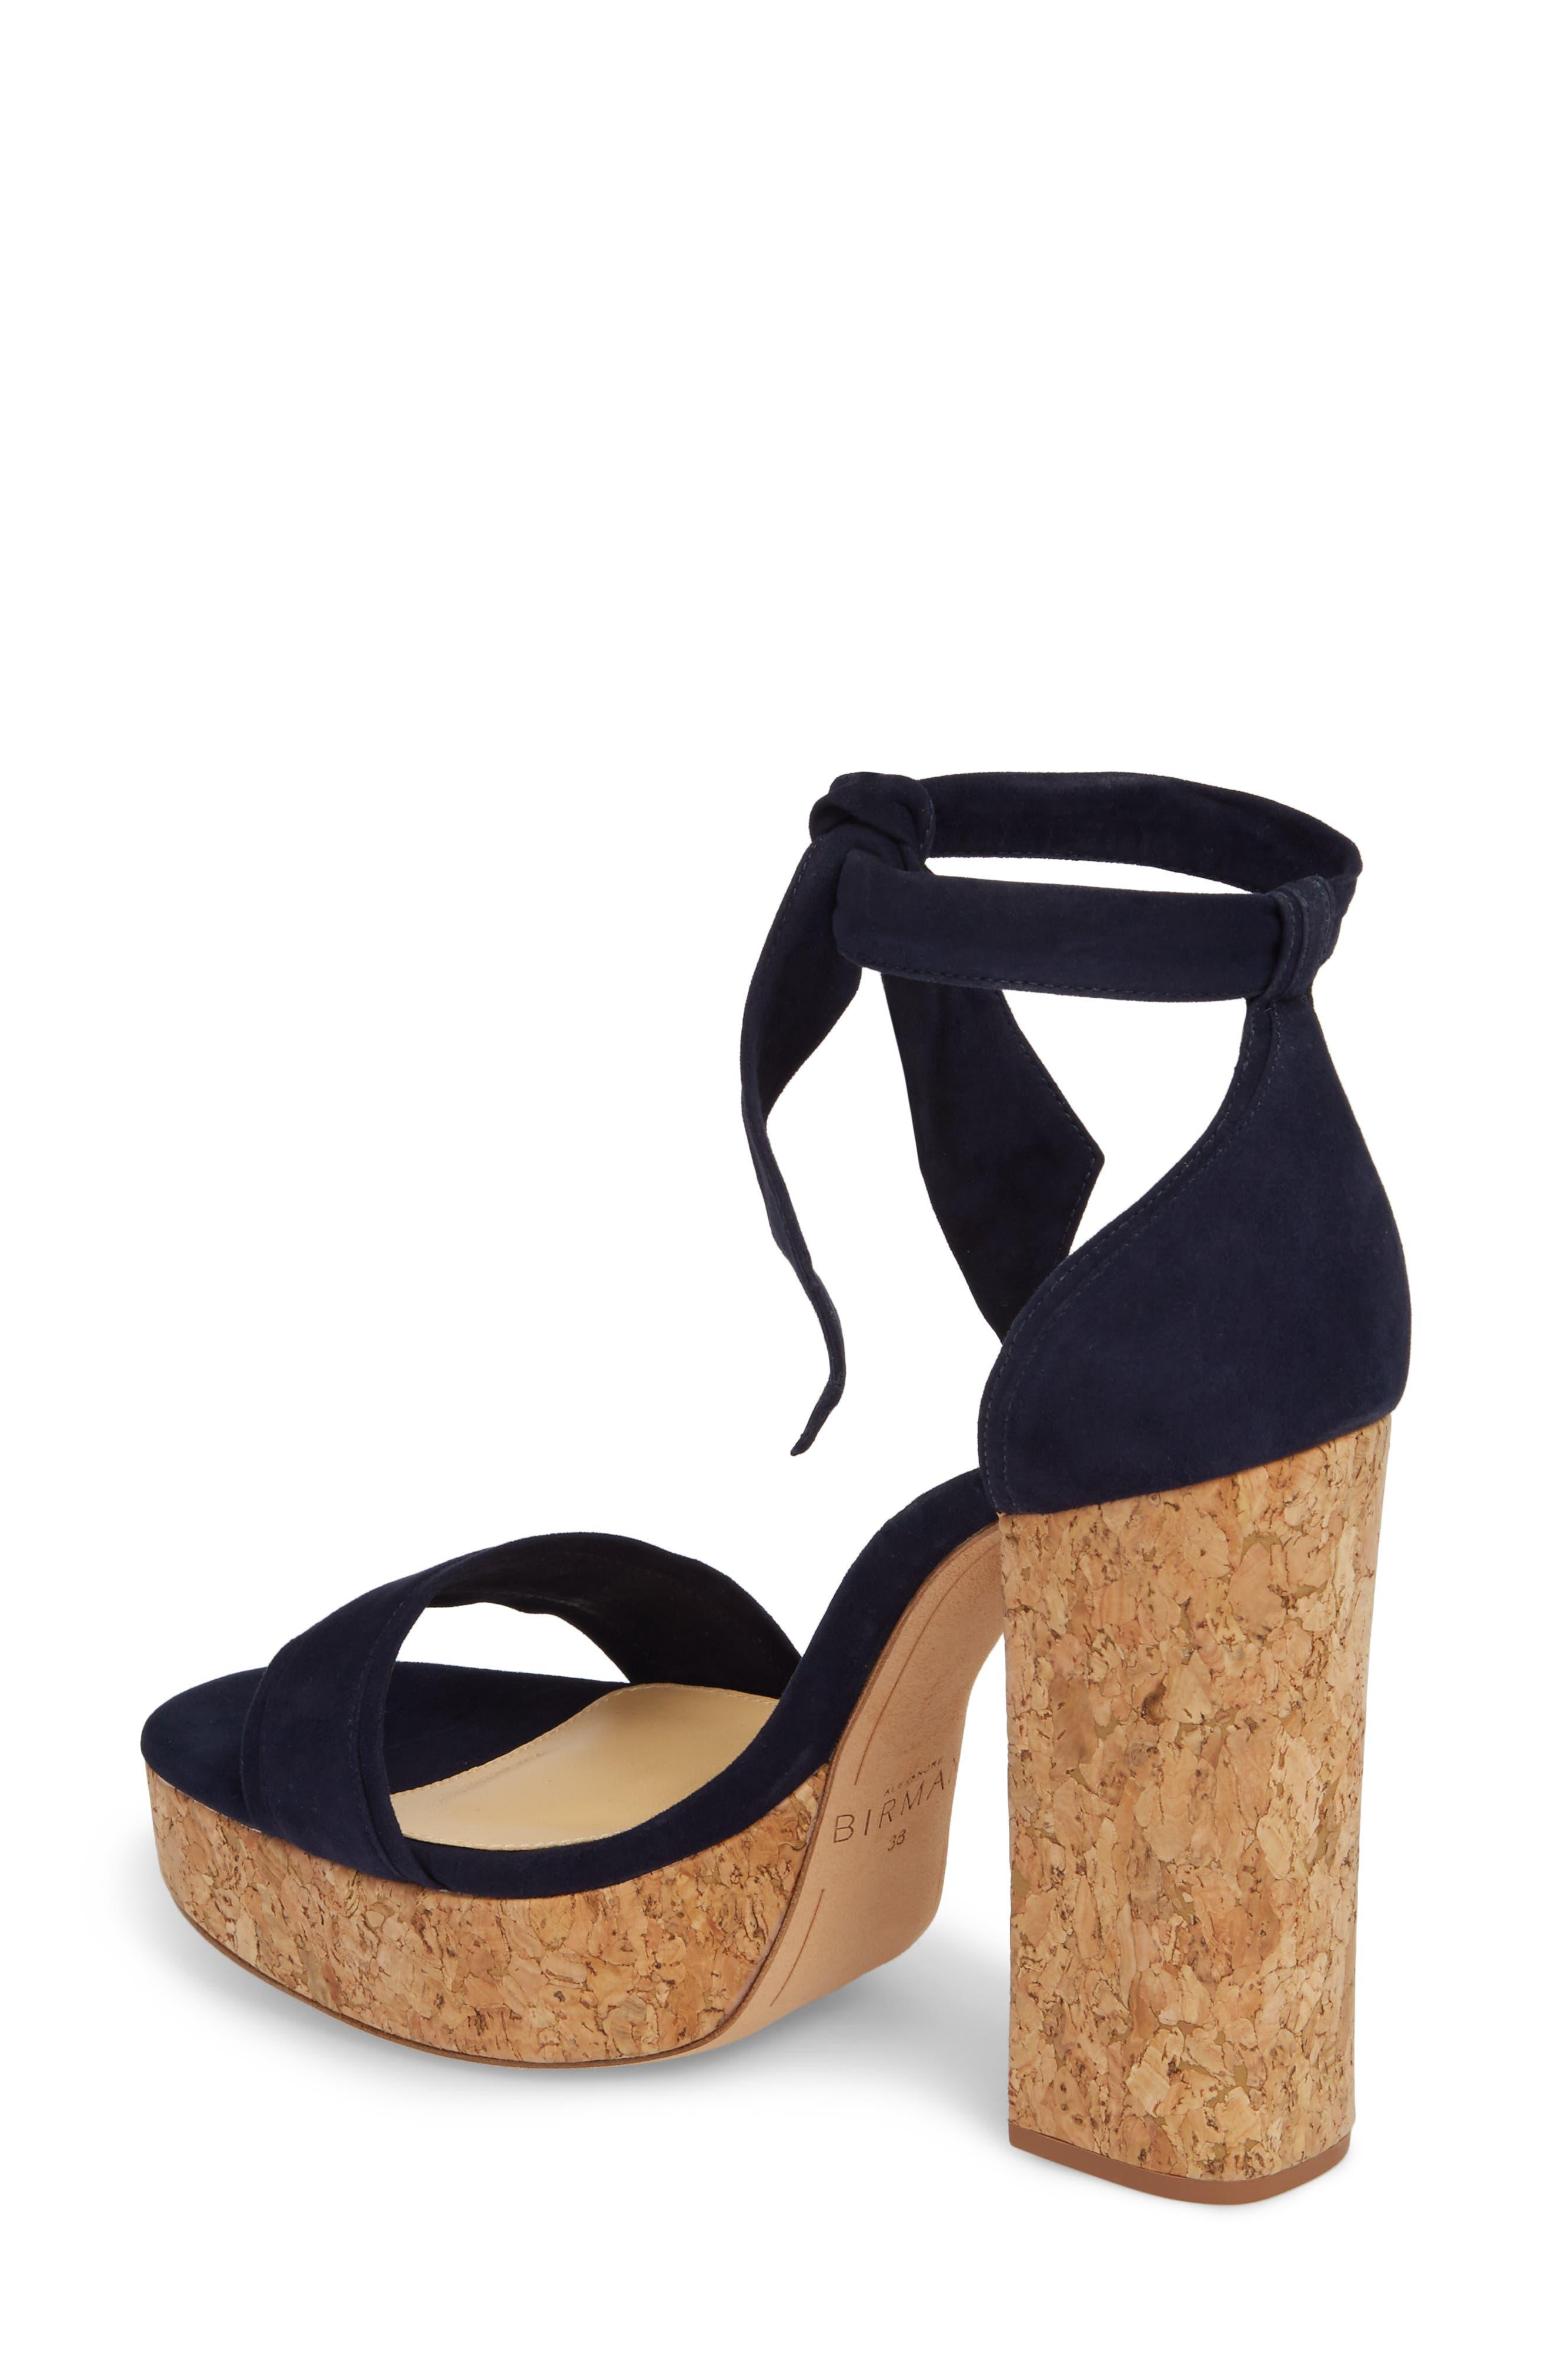 Celine Ankle Tie Platform Sandal,                             Alternate thumbnail 2, color,                             400